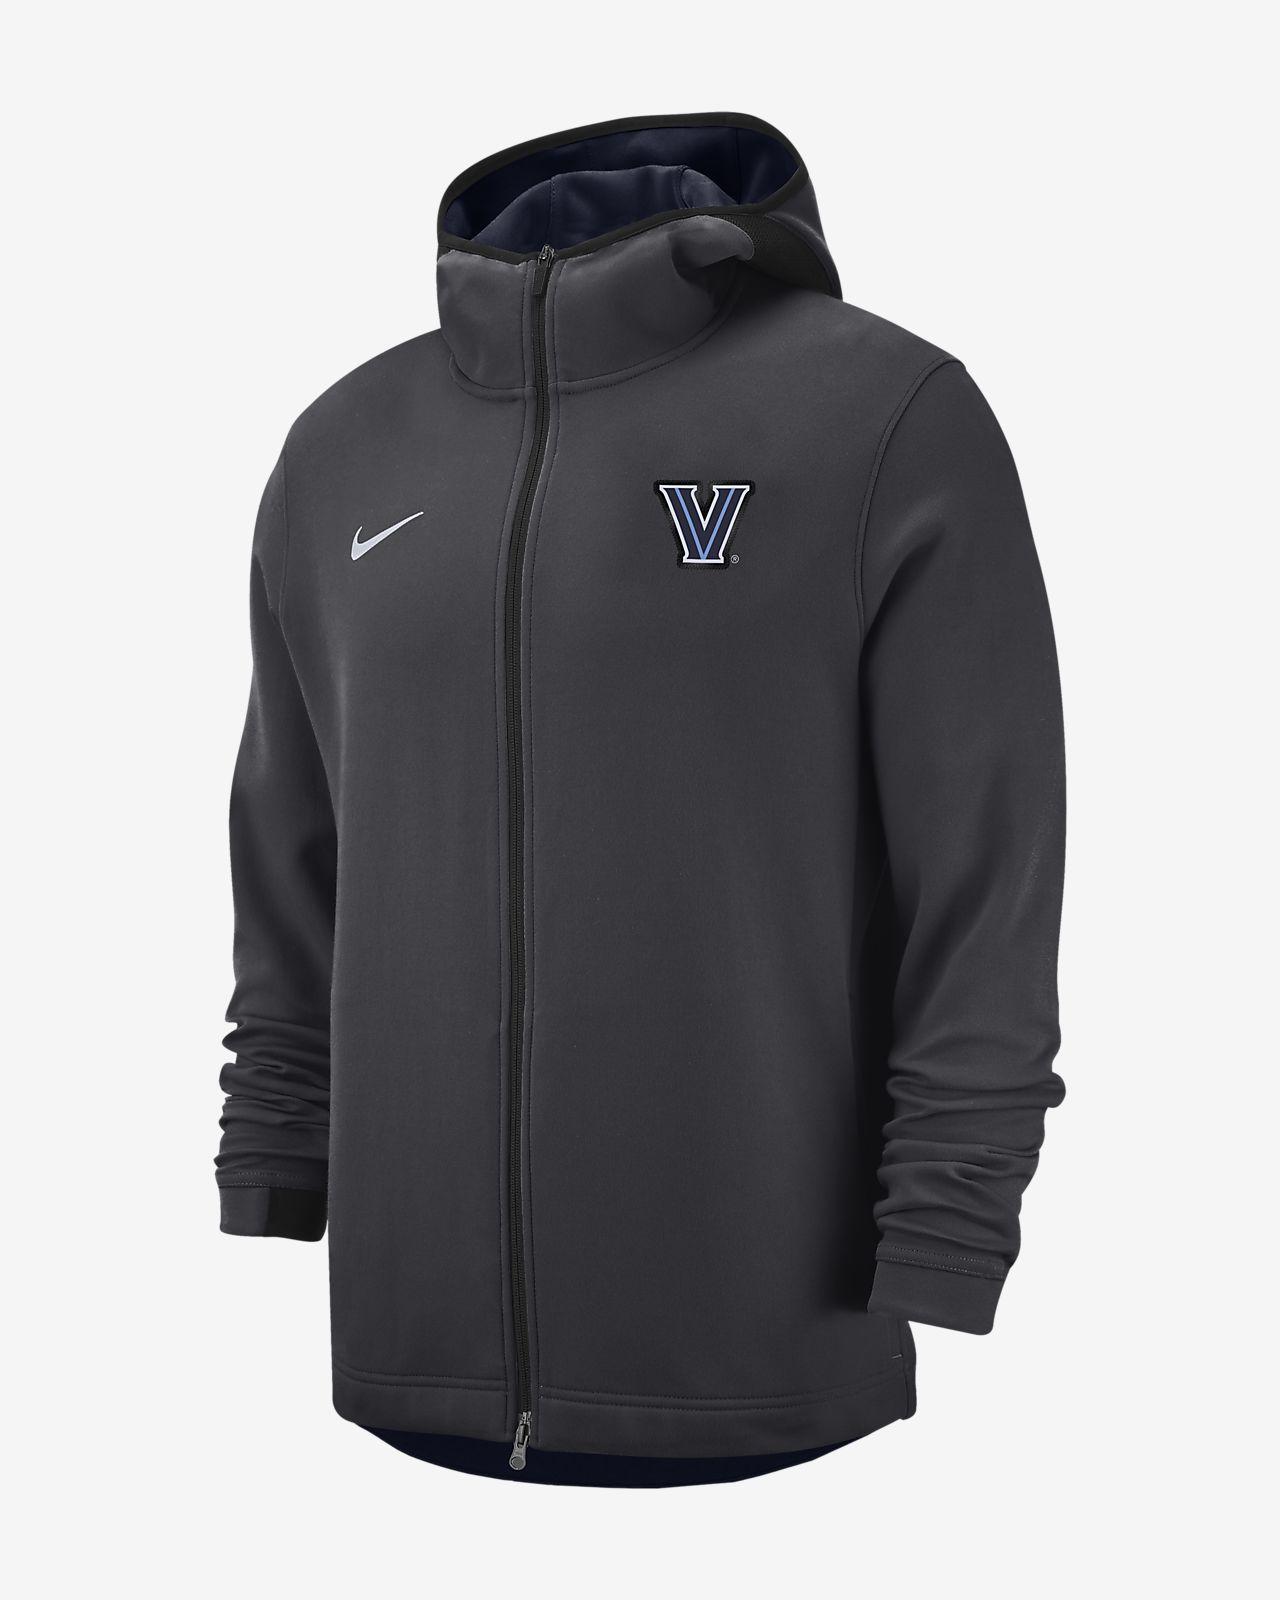 Nike College Dri FIT Showtime (Villanova) Men's Full Zip Hoodie